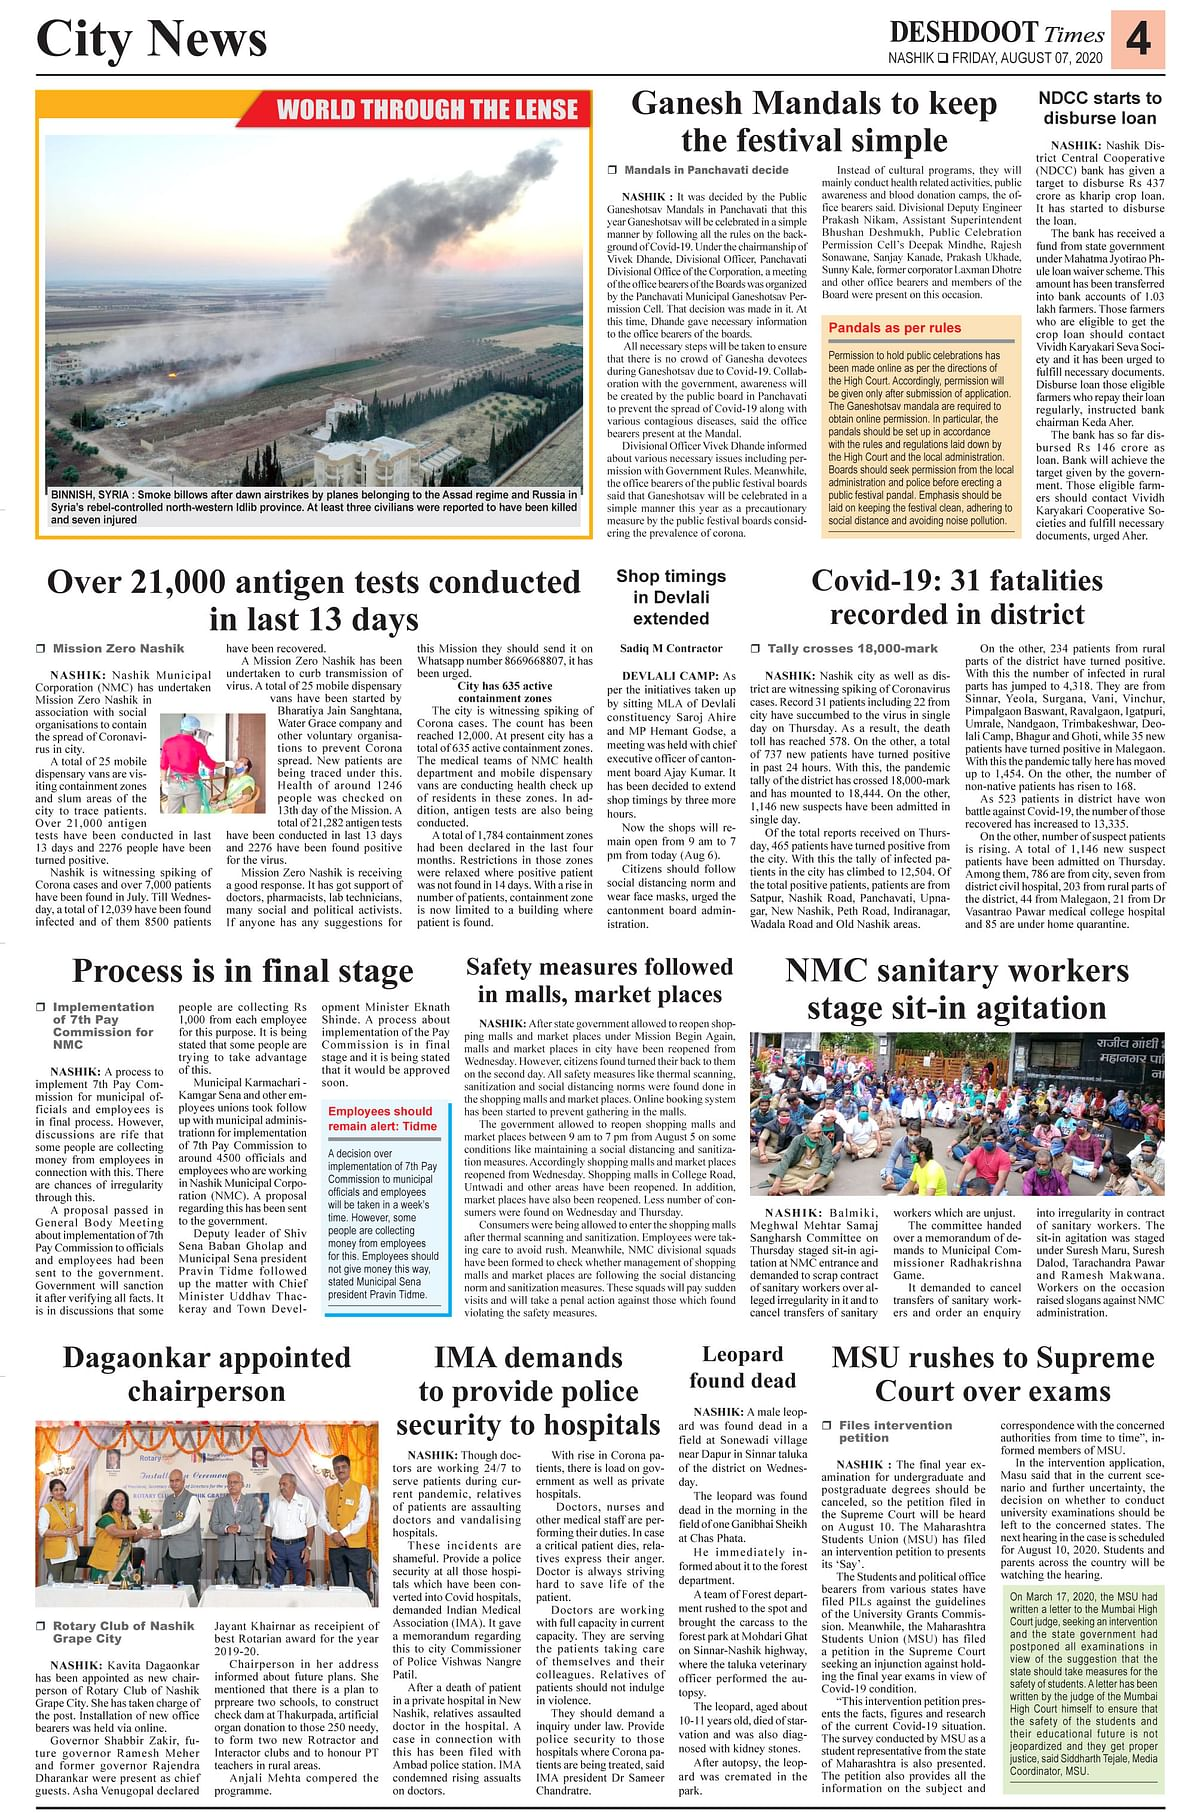 Deshdoot Times E Paper, 7 August 2020